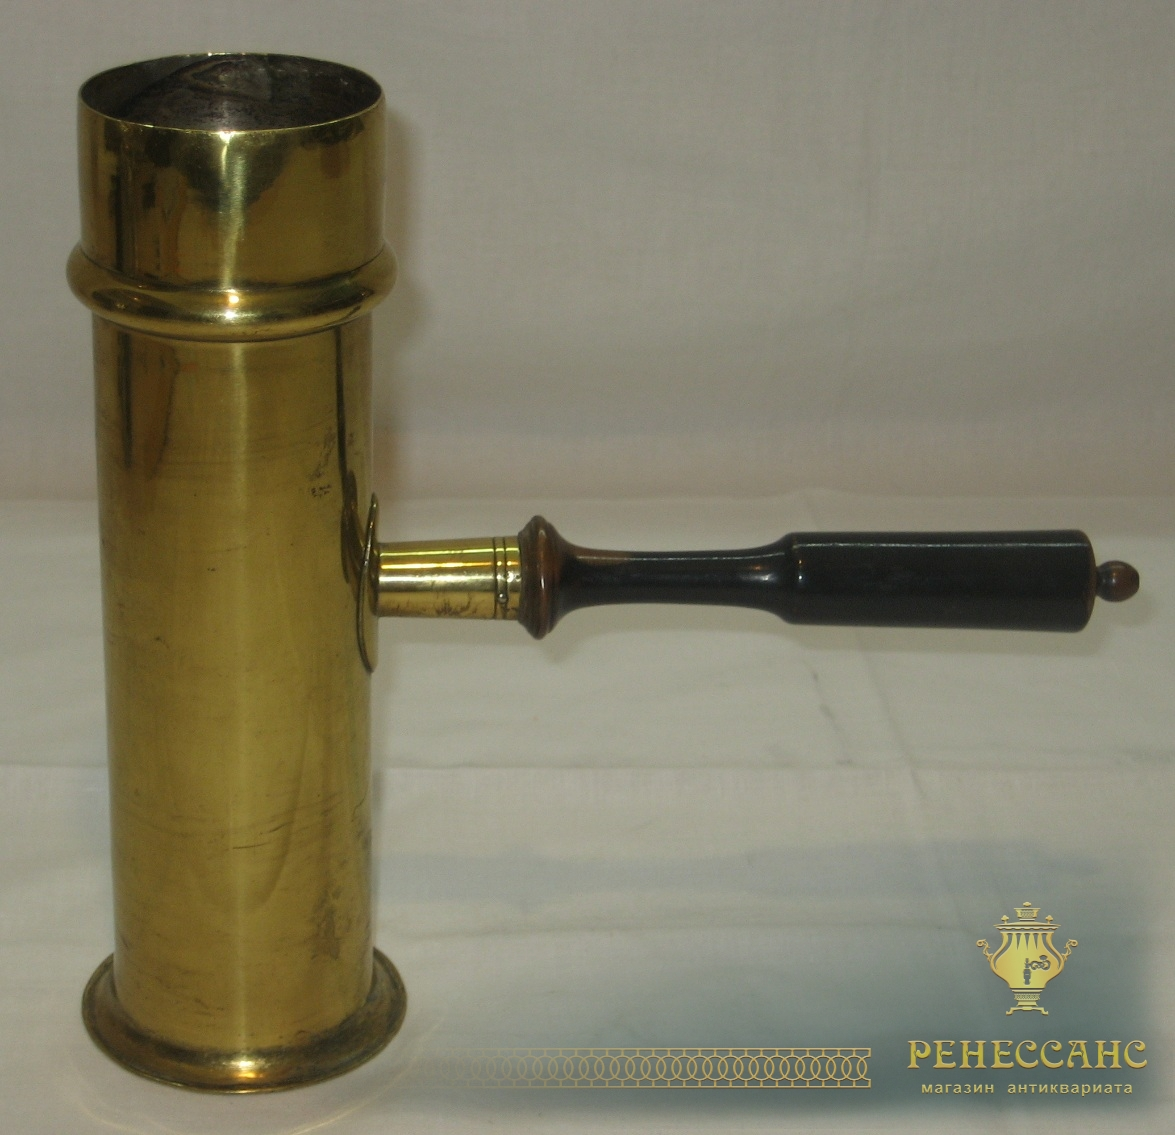 Труба к самовару, латунная, 19 век №2198